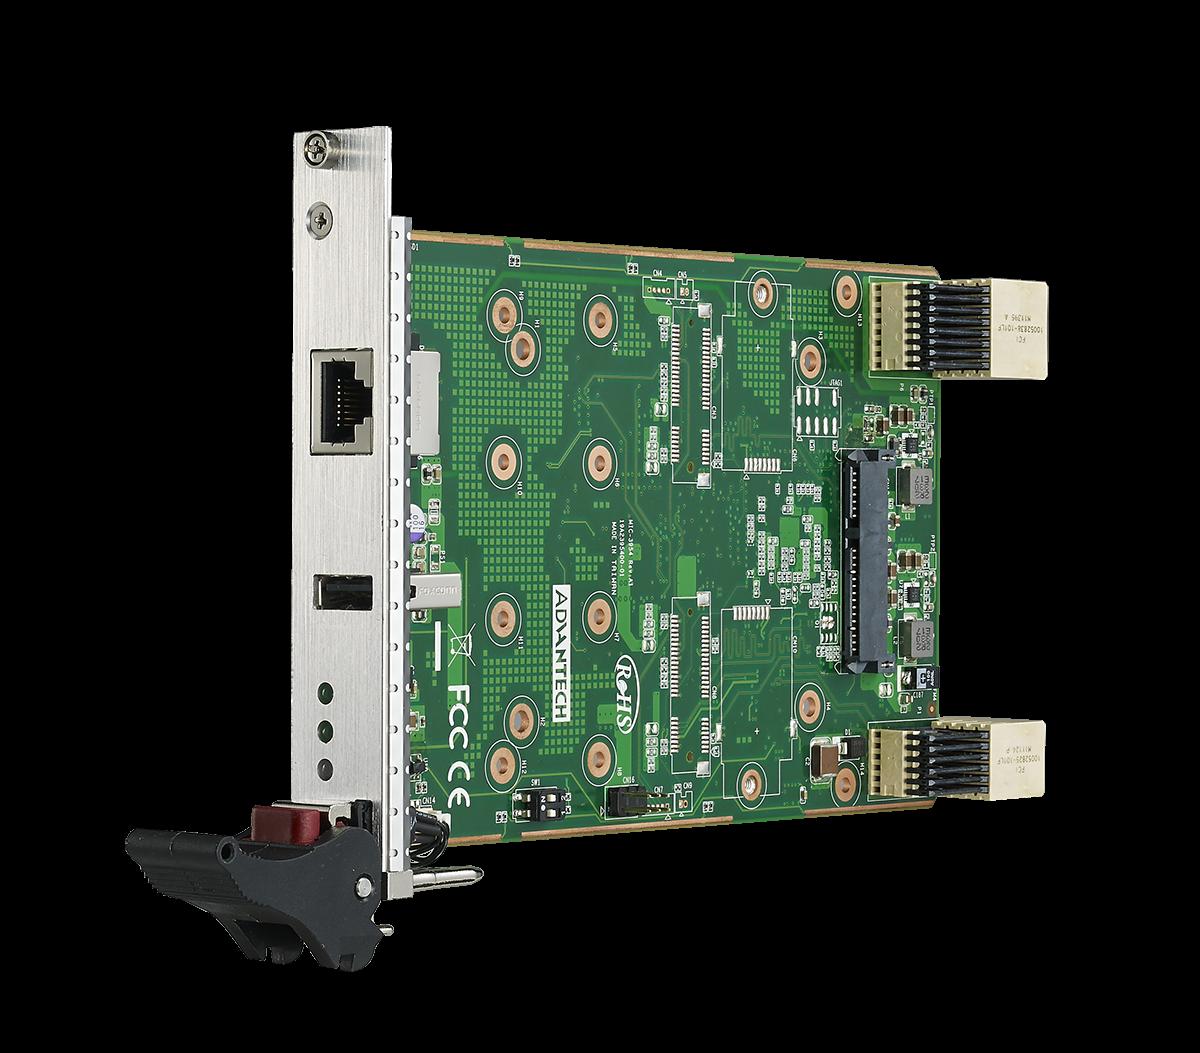 MIC-3954 3U CompactPCI® Serial Peripheral Board with PCIe® Mini Card or Storage Function